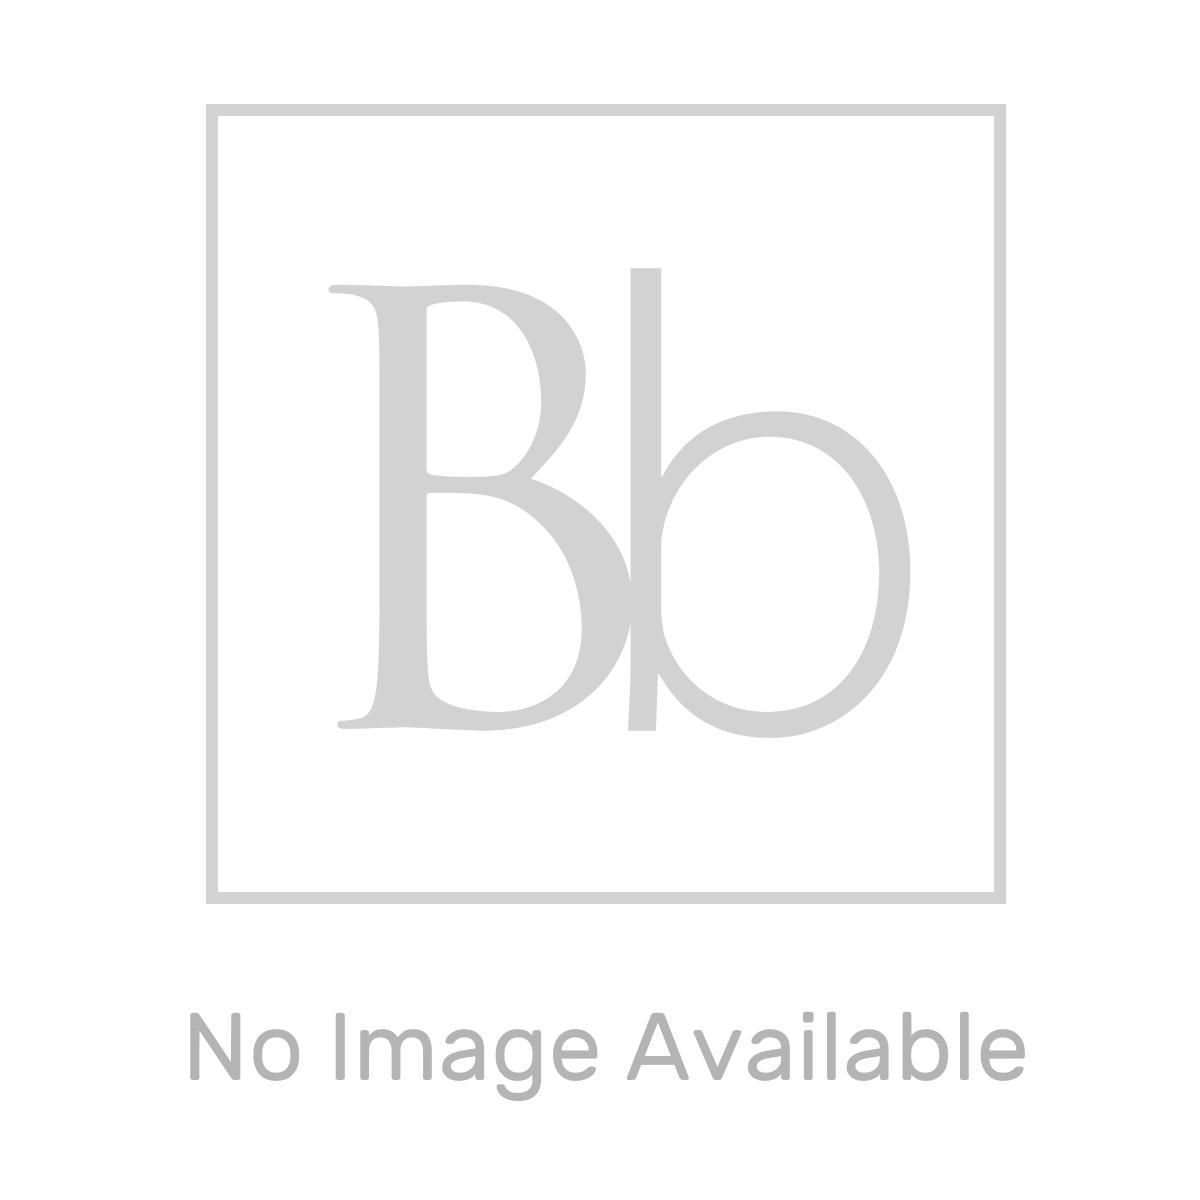 Merlyn Series 6 Single Door Quadrant Shower Enclosure